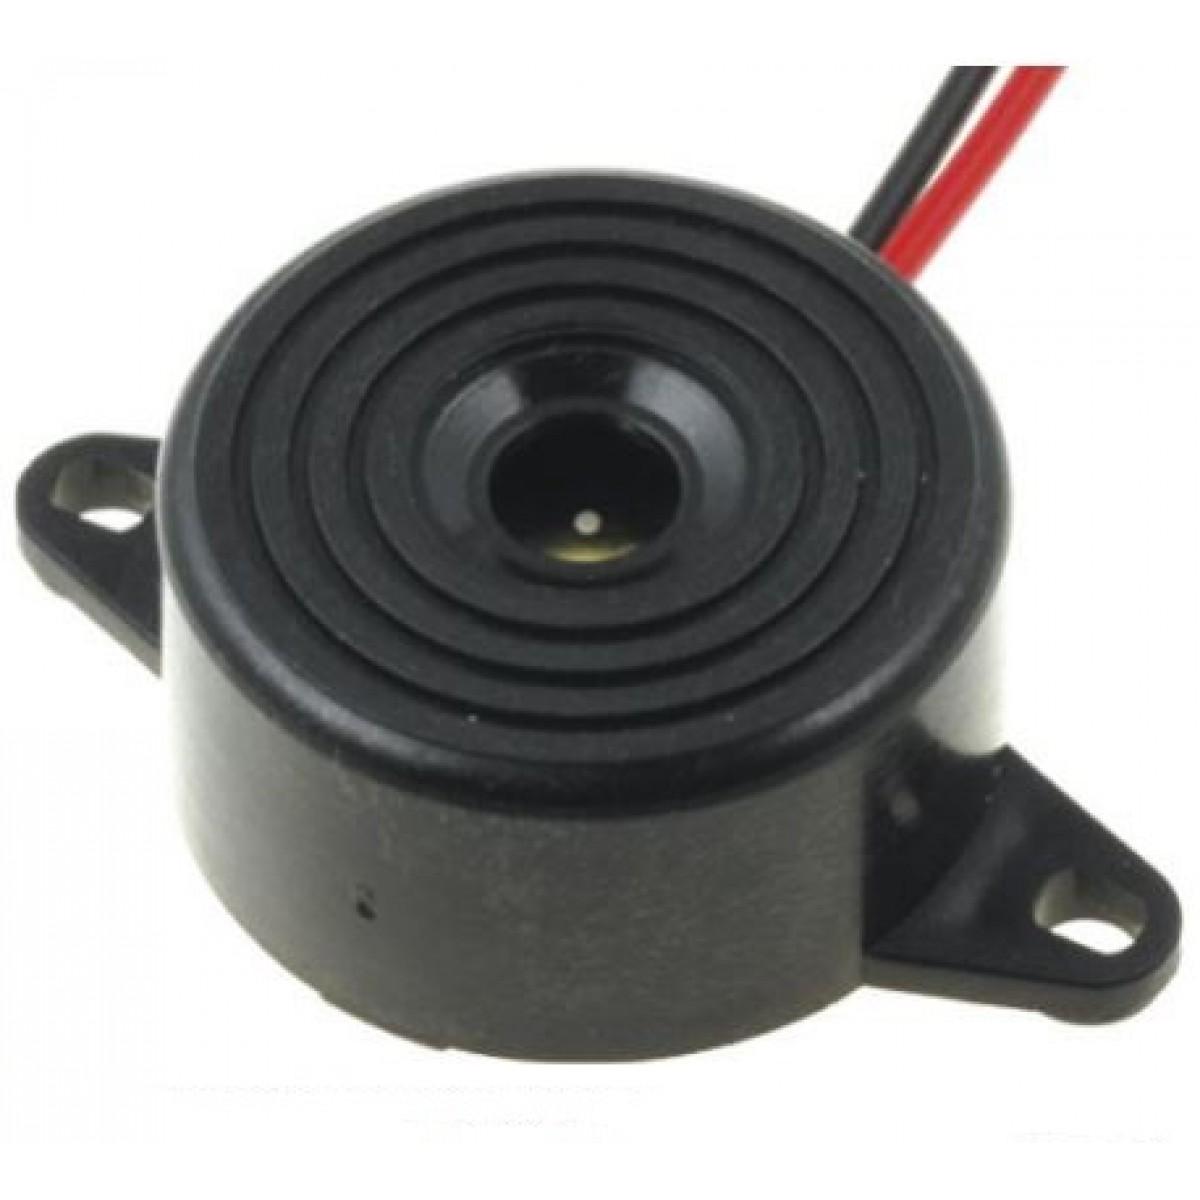 Piezo-Signalgeber 1,5-24VDC 85dB | Elektronik für jedermann